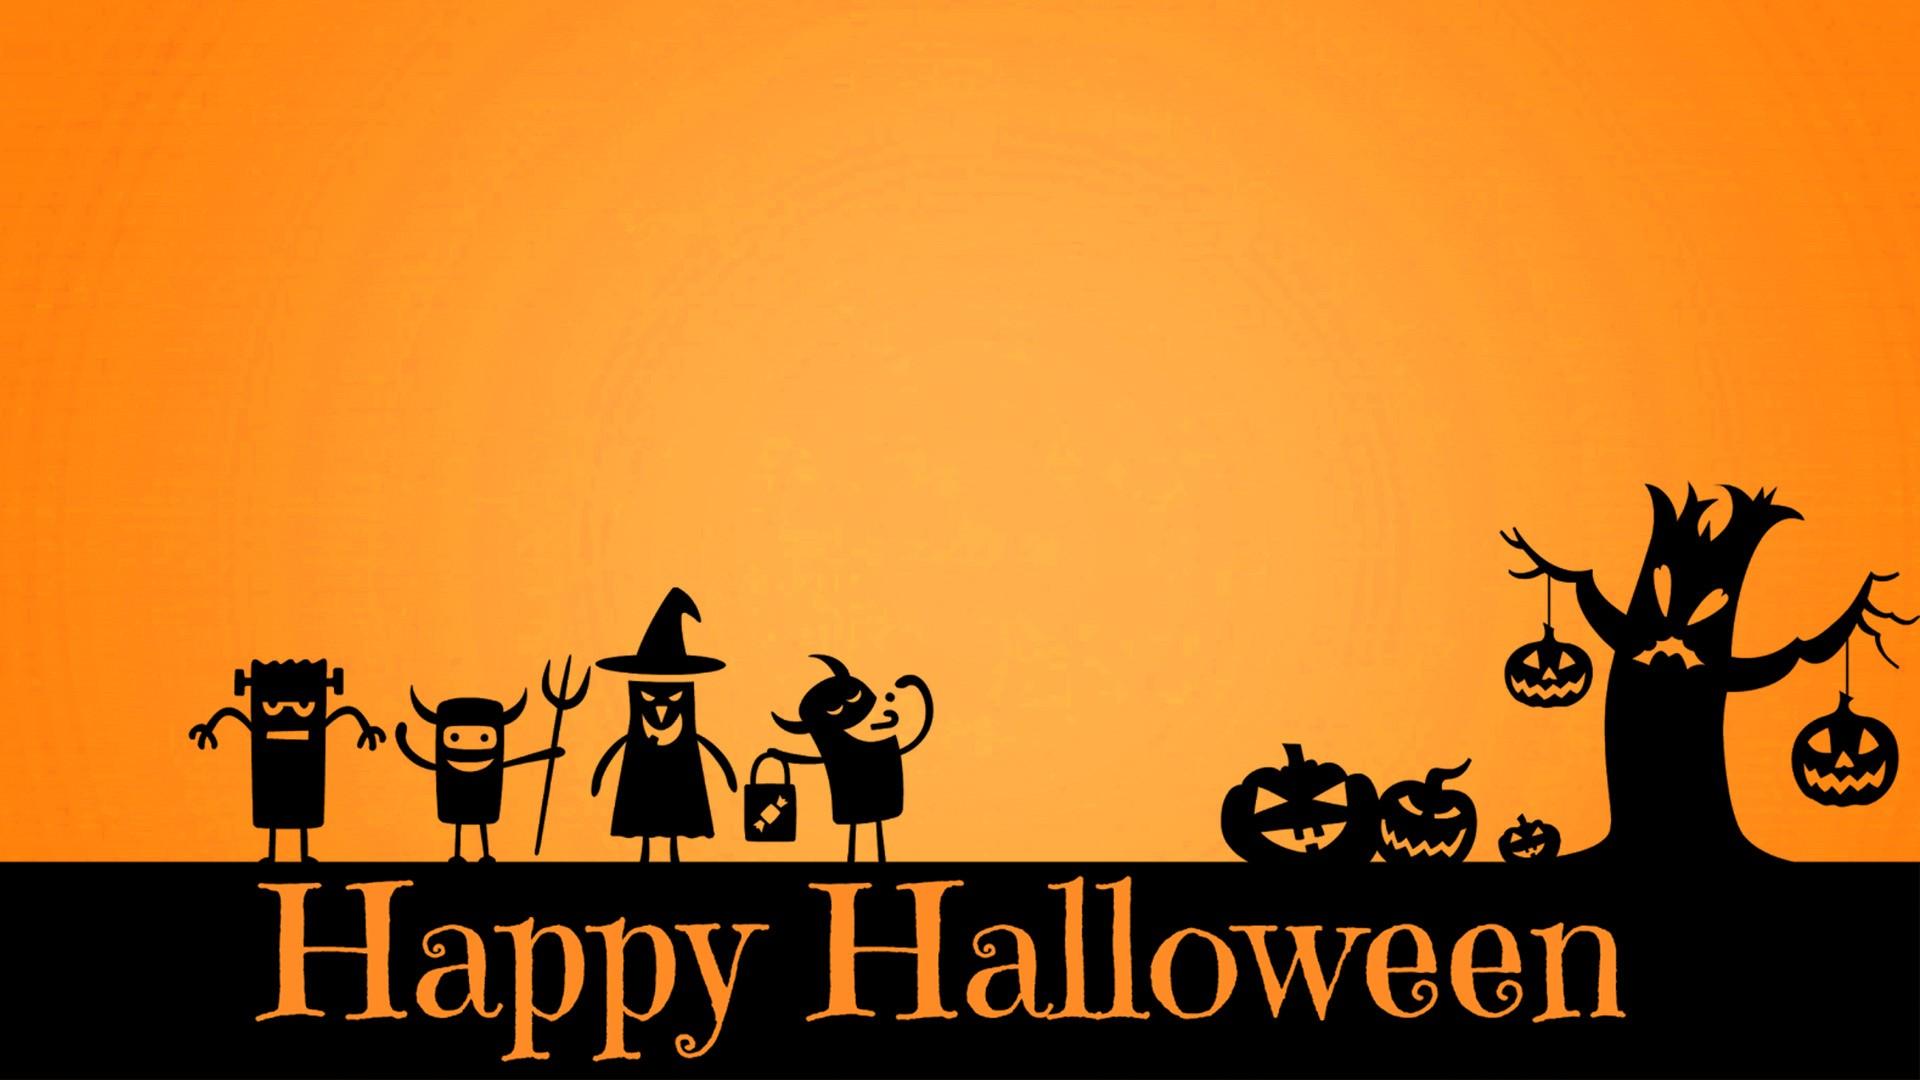 200 2007947 happy halloween background hd wallpapers